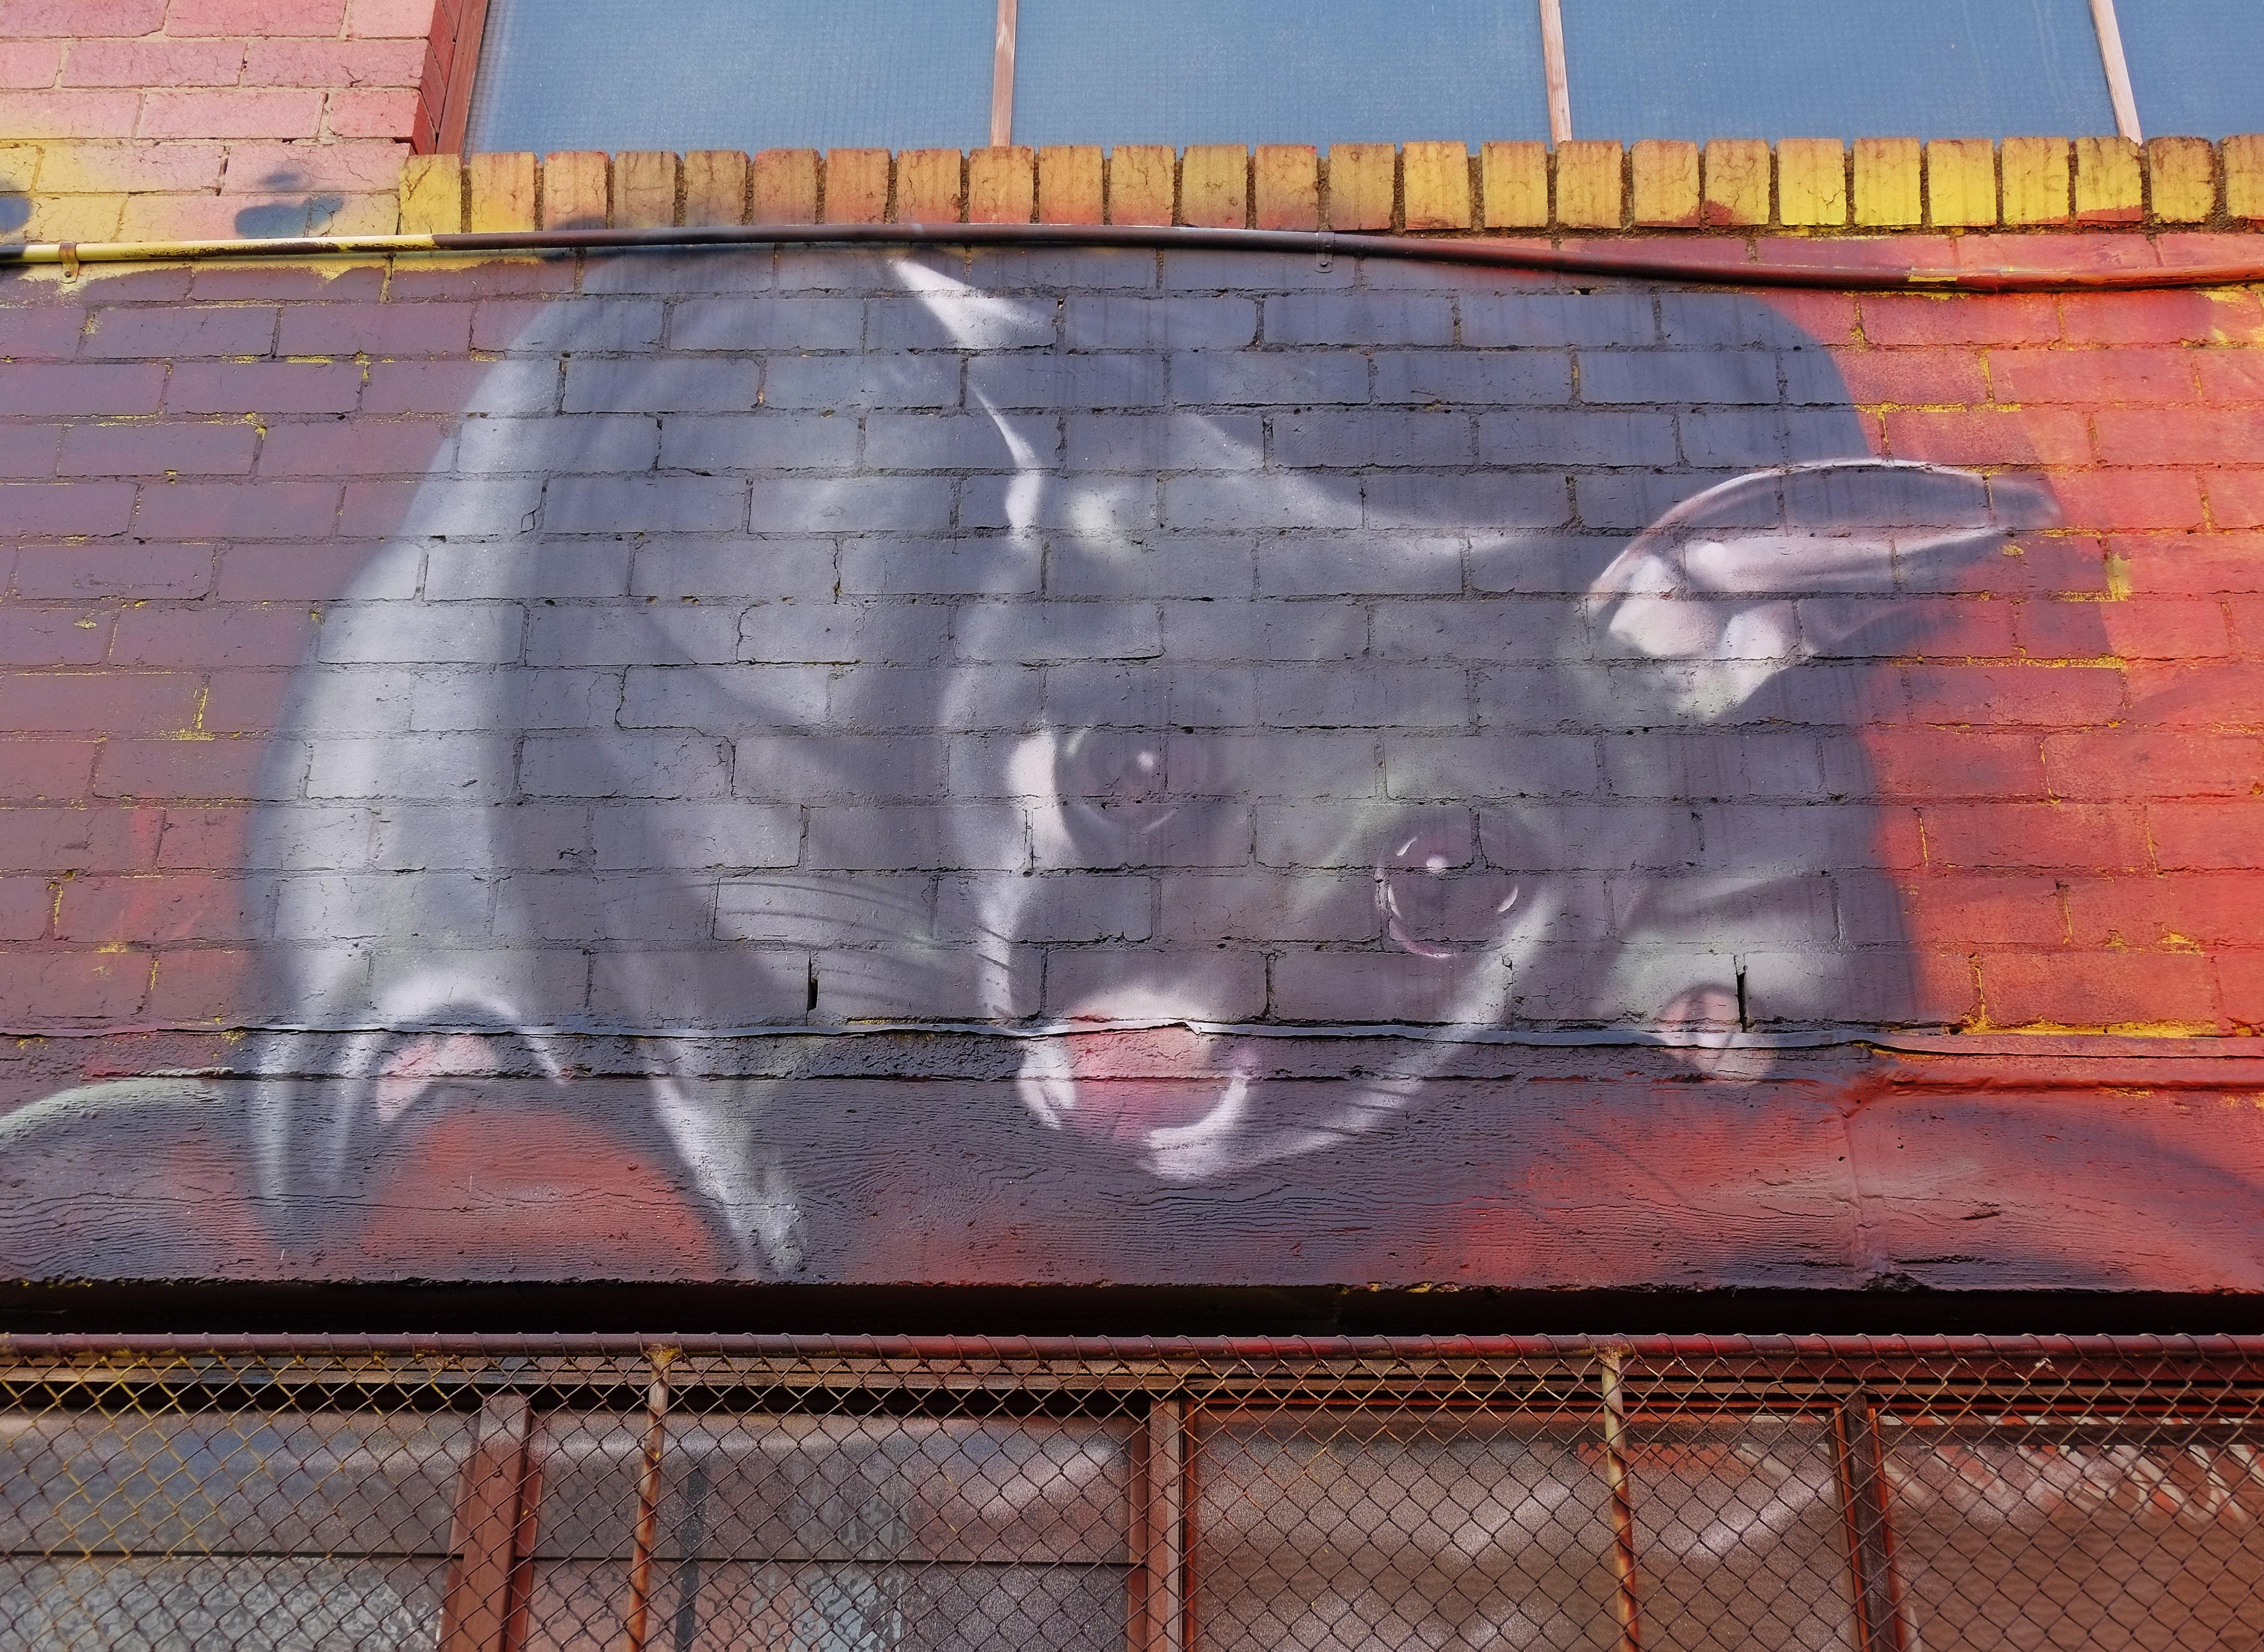 street art mural of a sugar glider, a small rat-like rodent